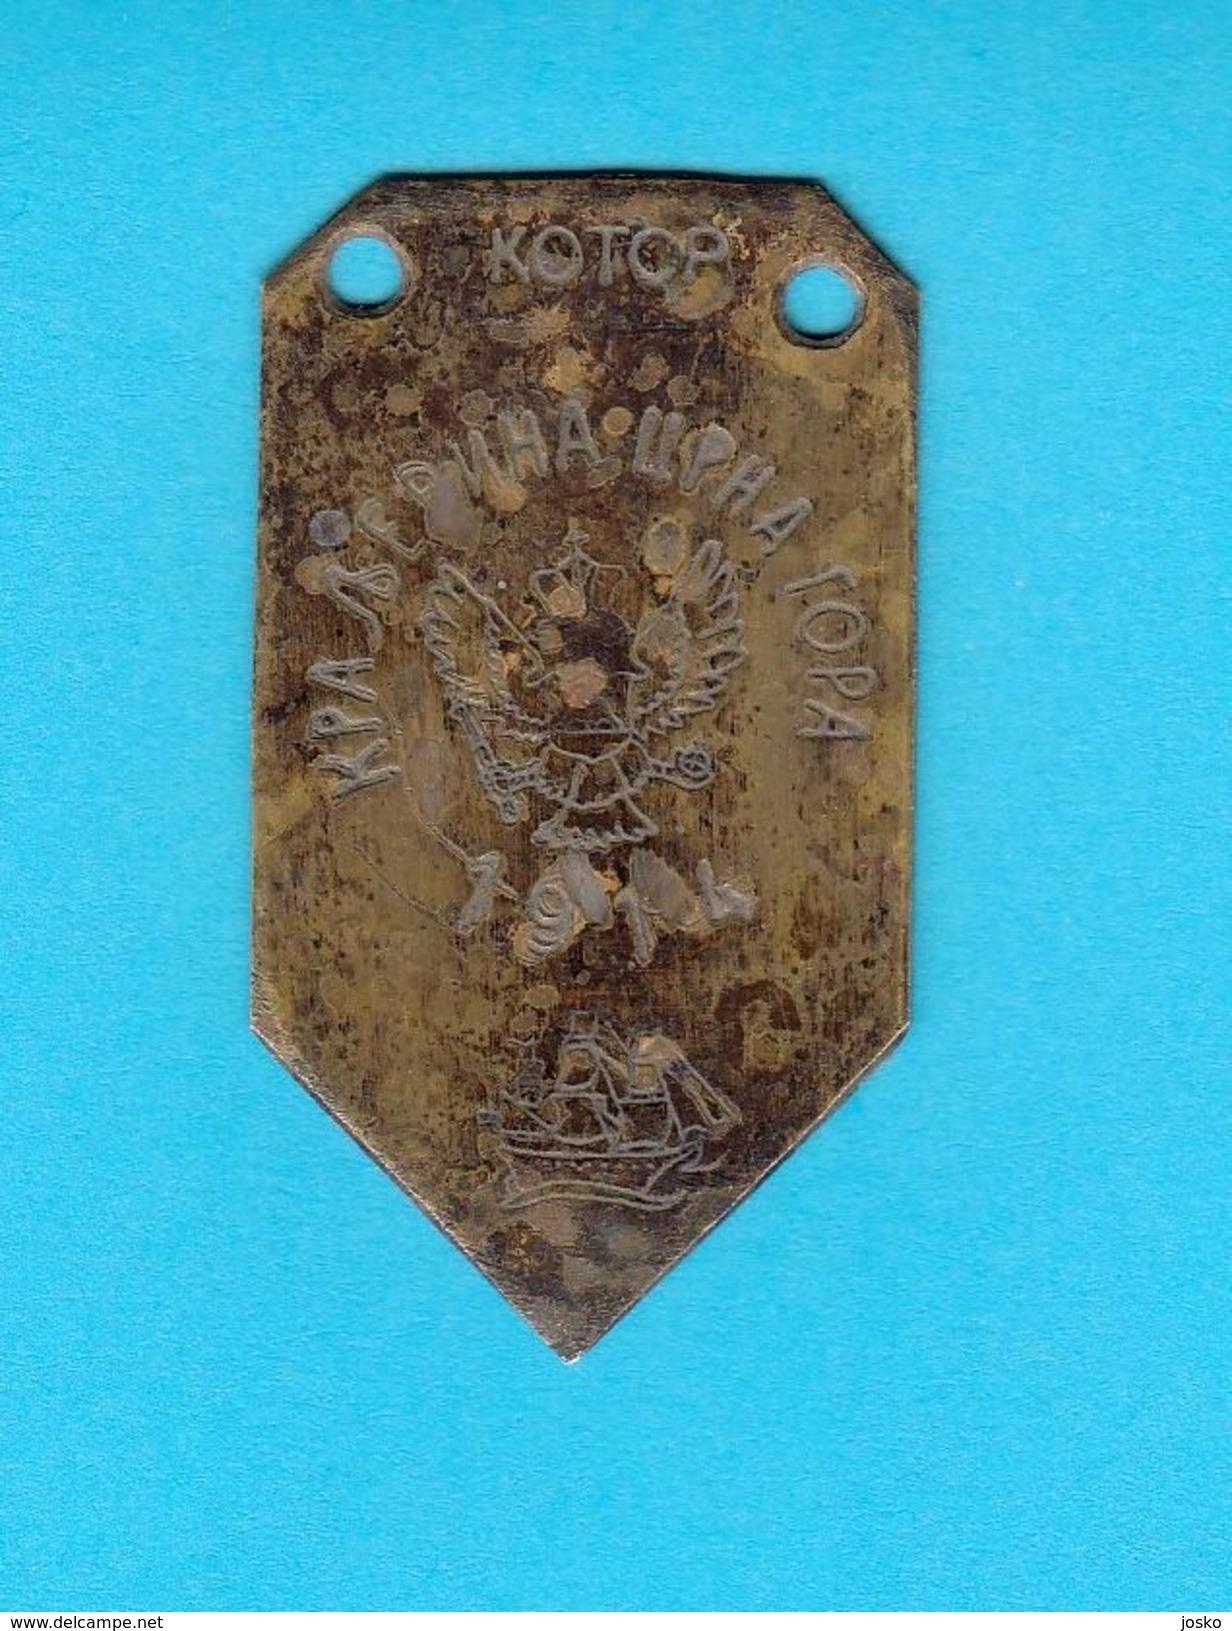 KOTOR - MONTENEGRO KINGDOM 1914. - Old Rare Brass Plate * Sailing Ship * Kraljevina Crna Gora - Other Collections